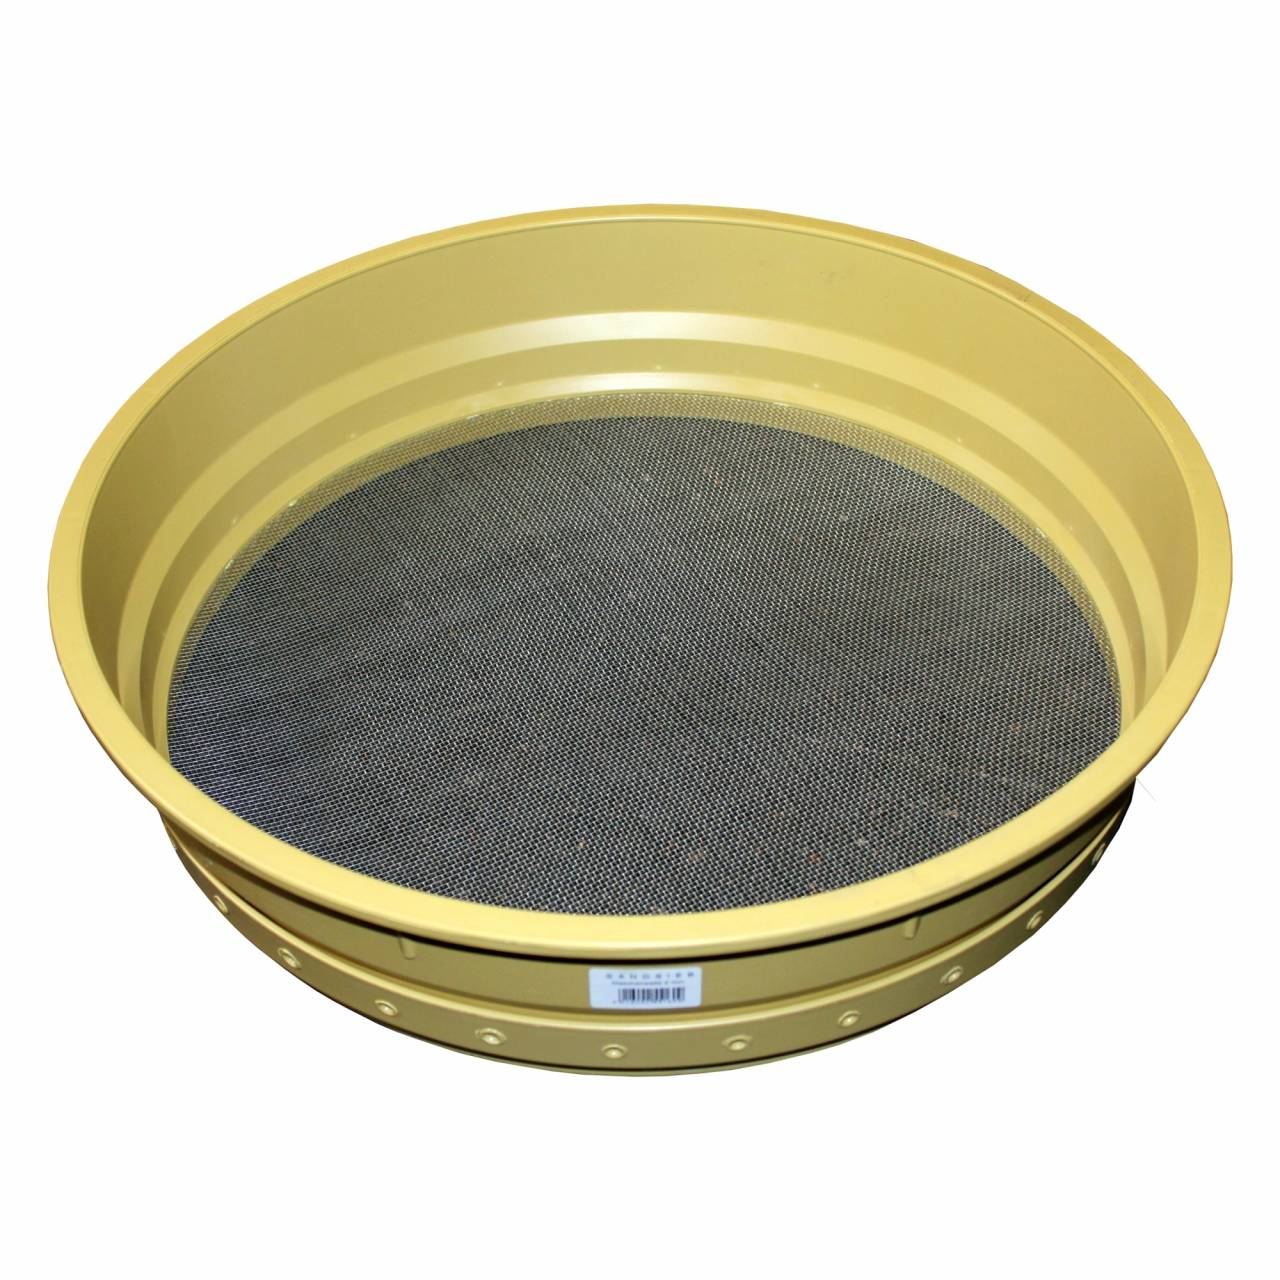 Sandsieb 2 mm / Ø 500 mm, Drahtgewebe, verzinkt